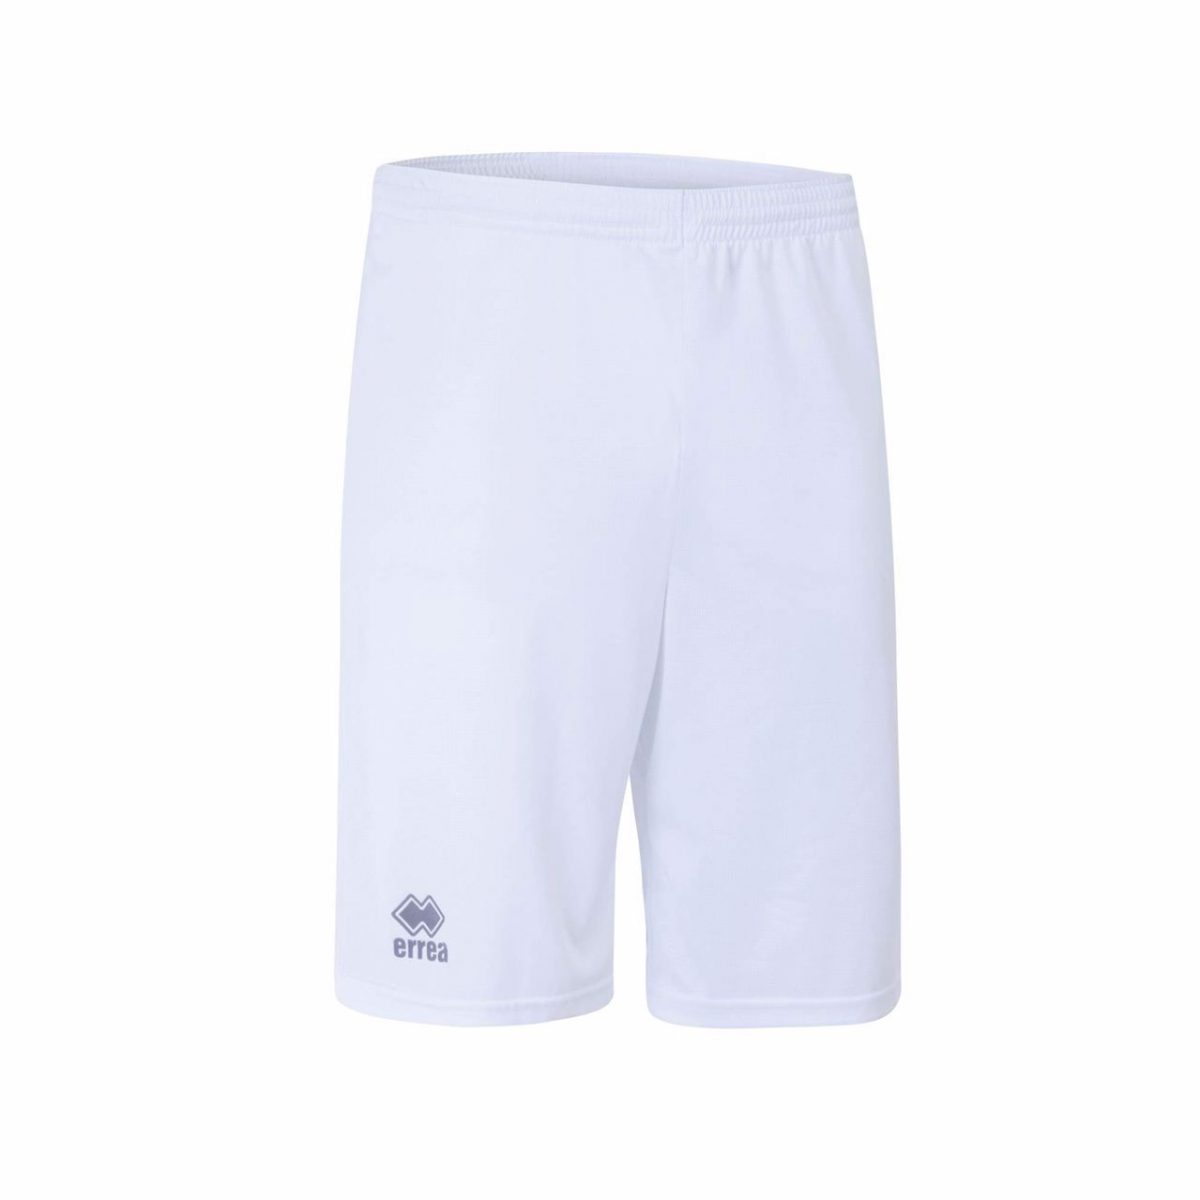 Errea Dallas 3.0 Basketball Shorts FP710Z